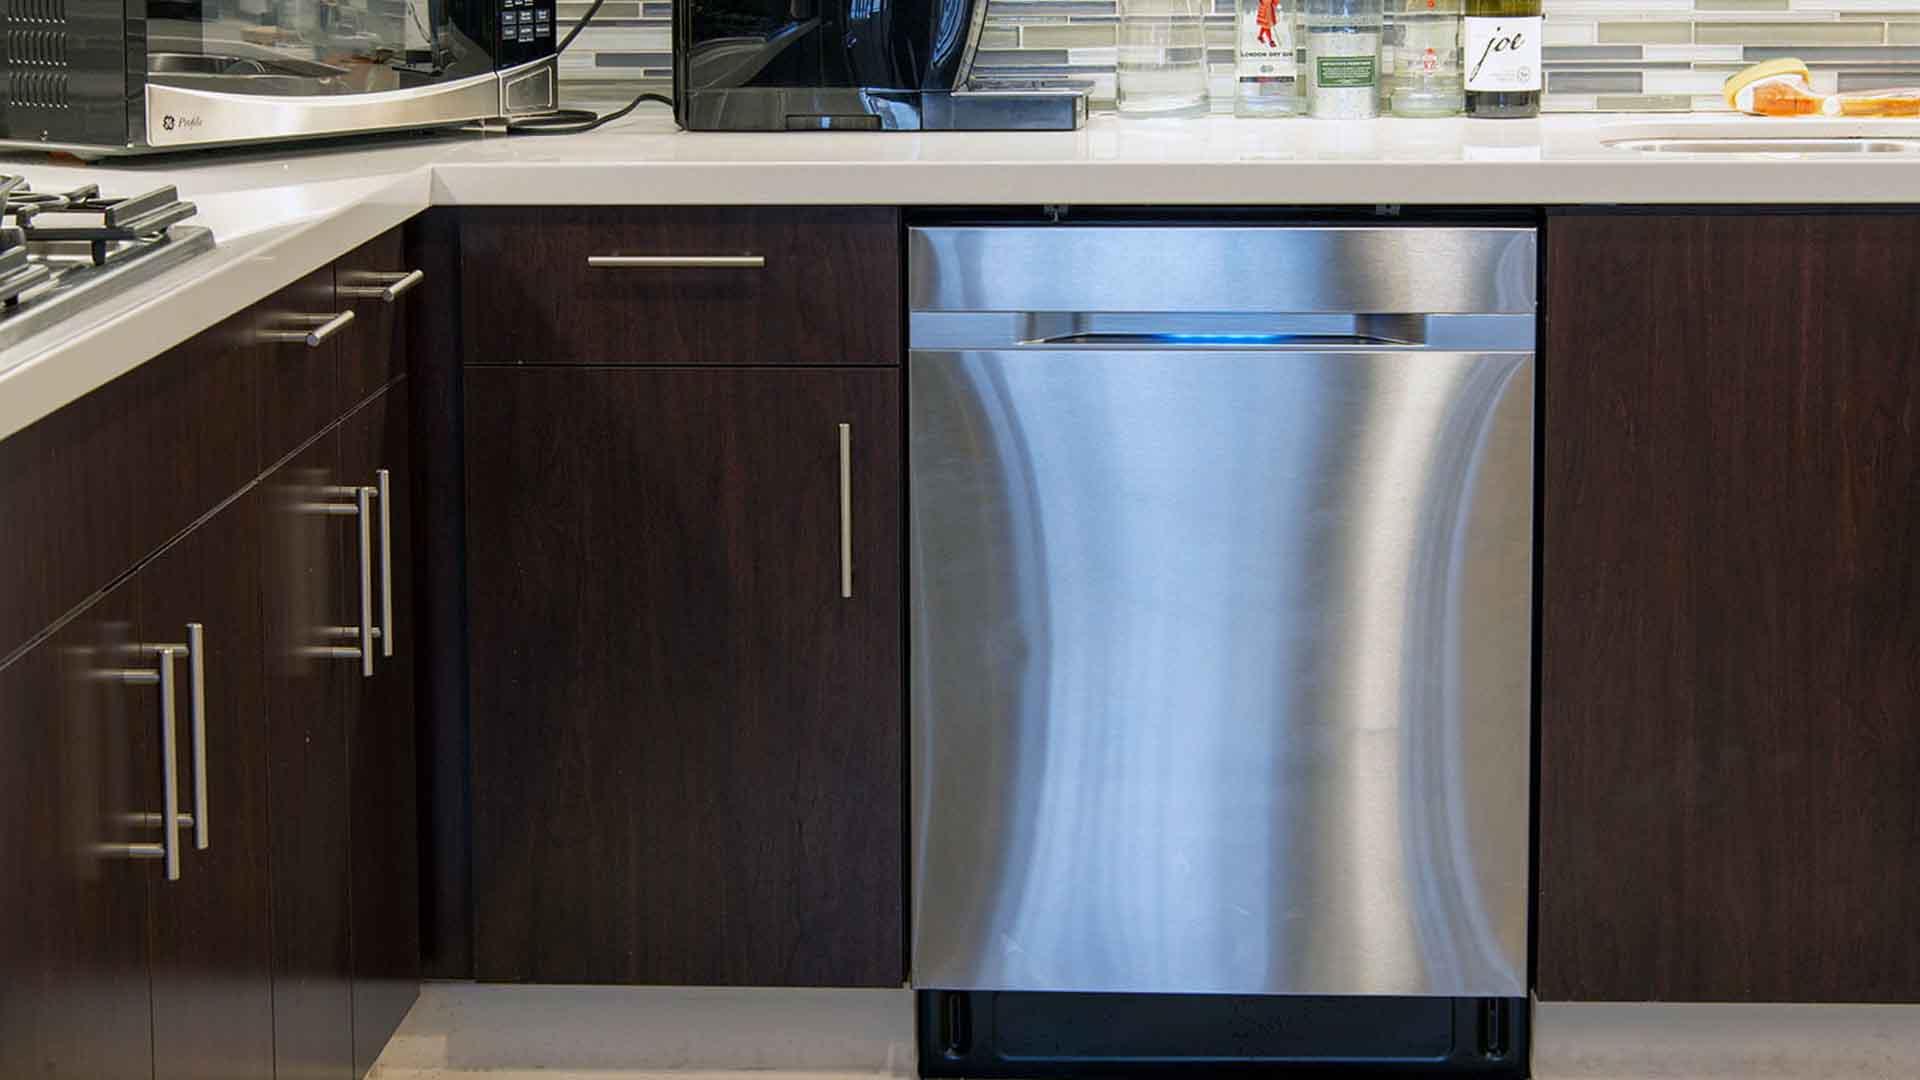 Samsung Dishwasher Repair Service | Samsung Appliance Repair